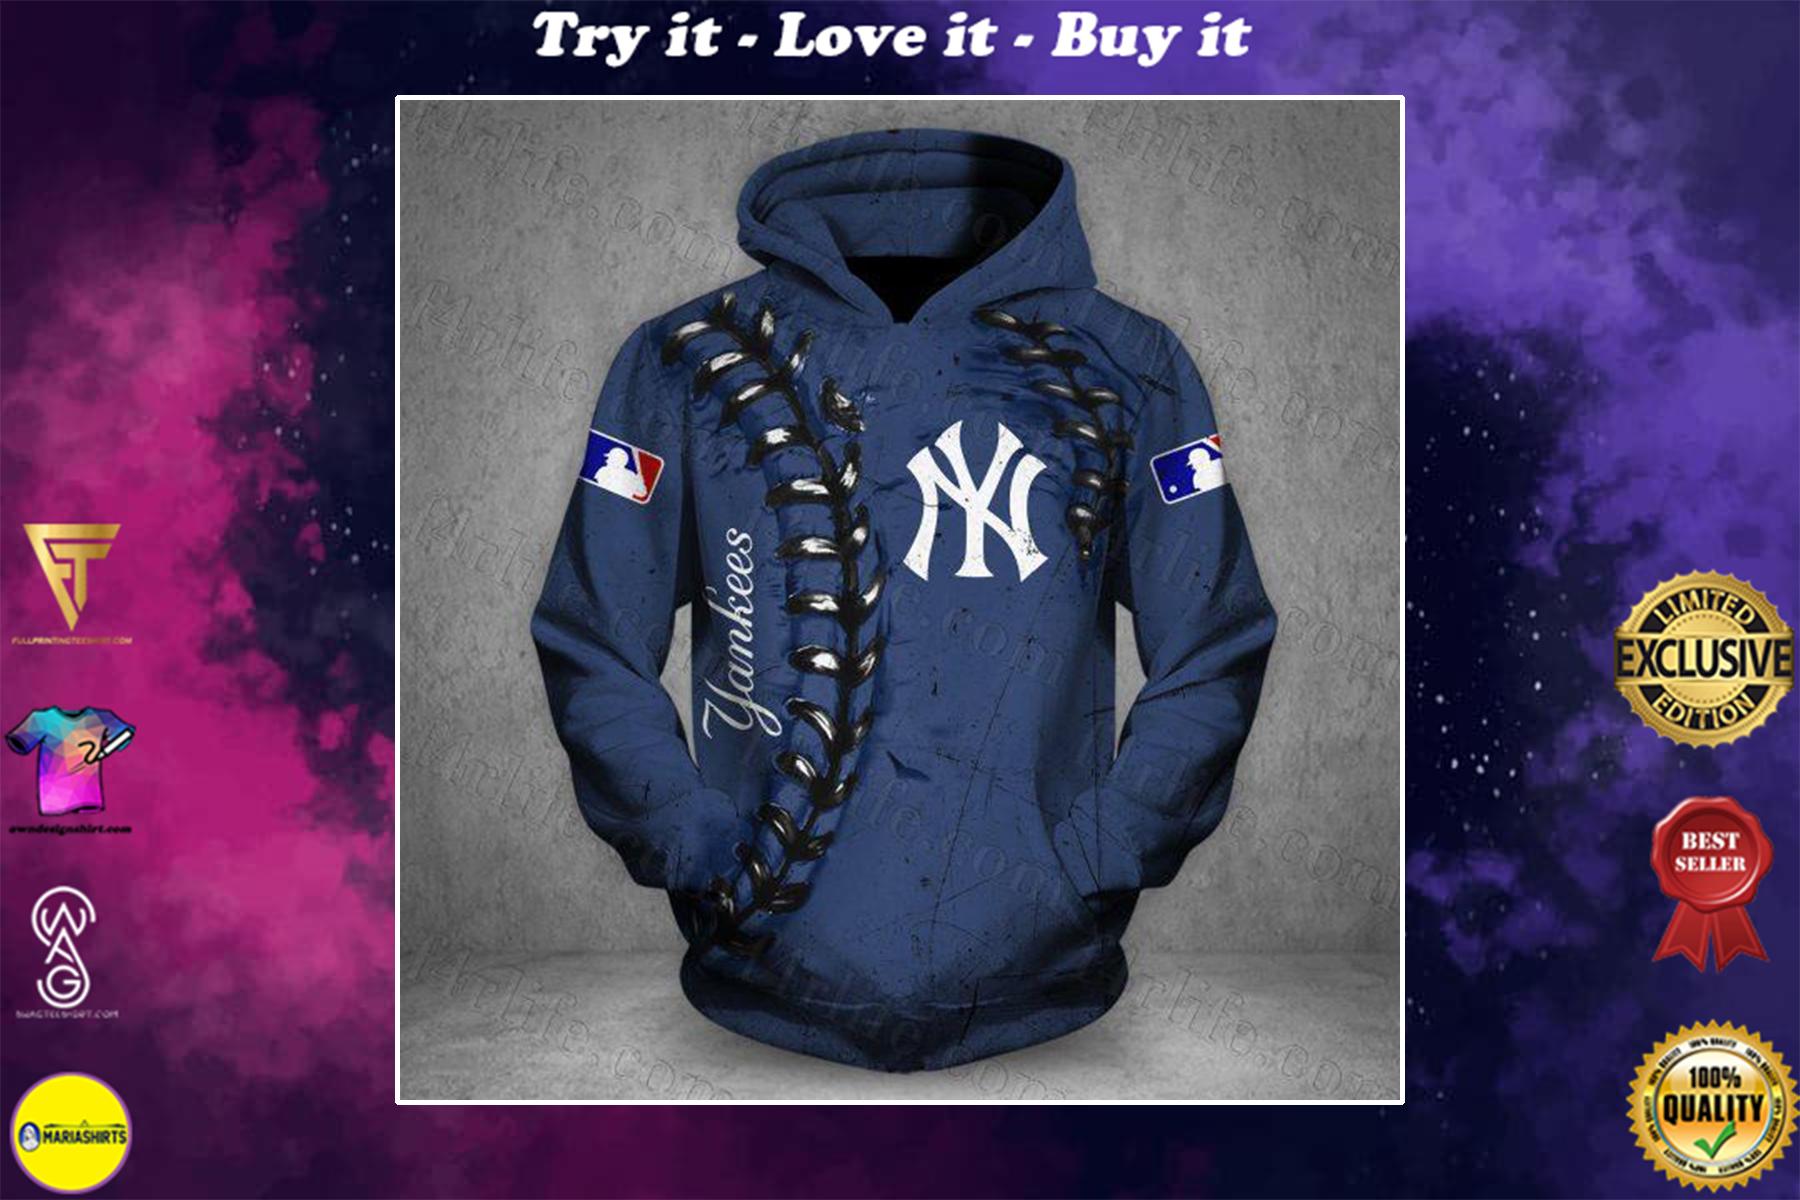 [highest selling] major league baseball new york yankees full over printed shirt - maria